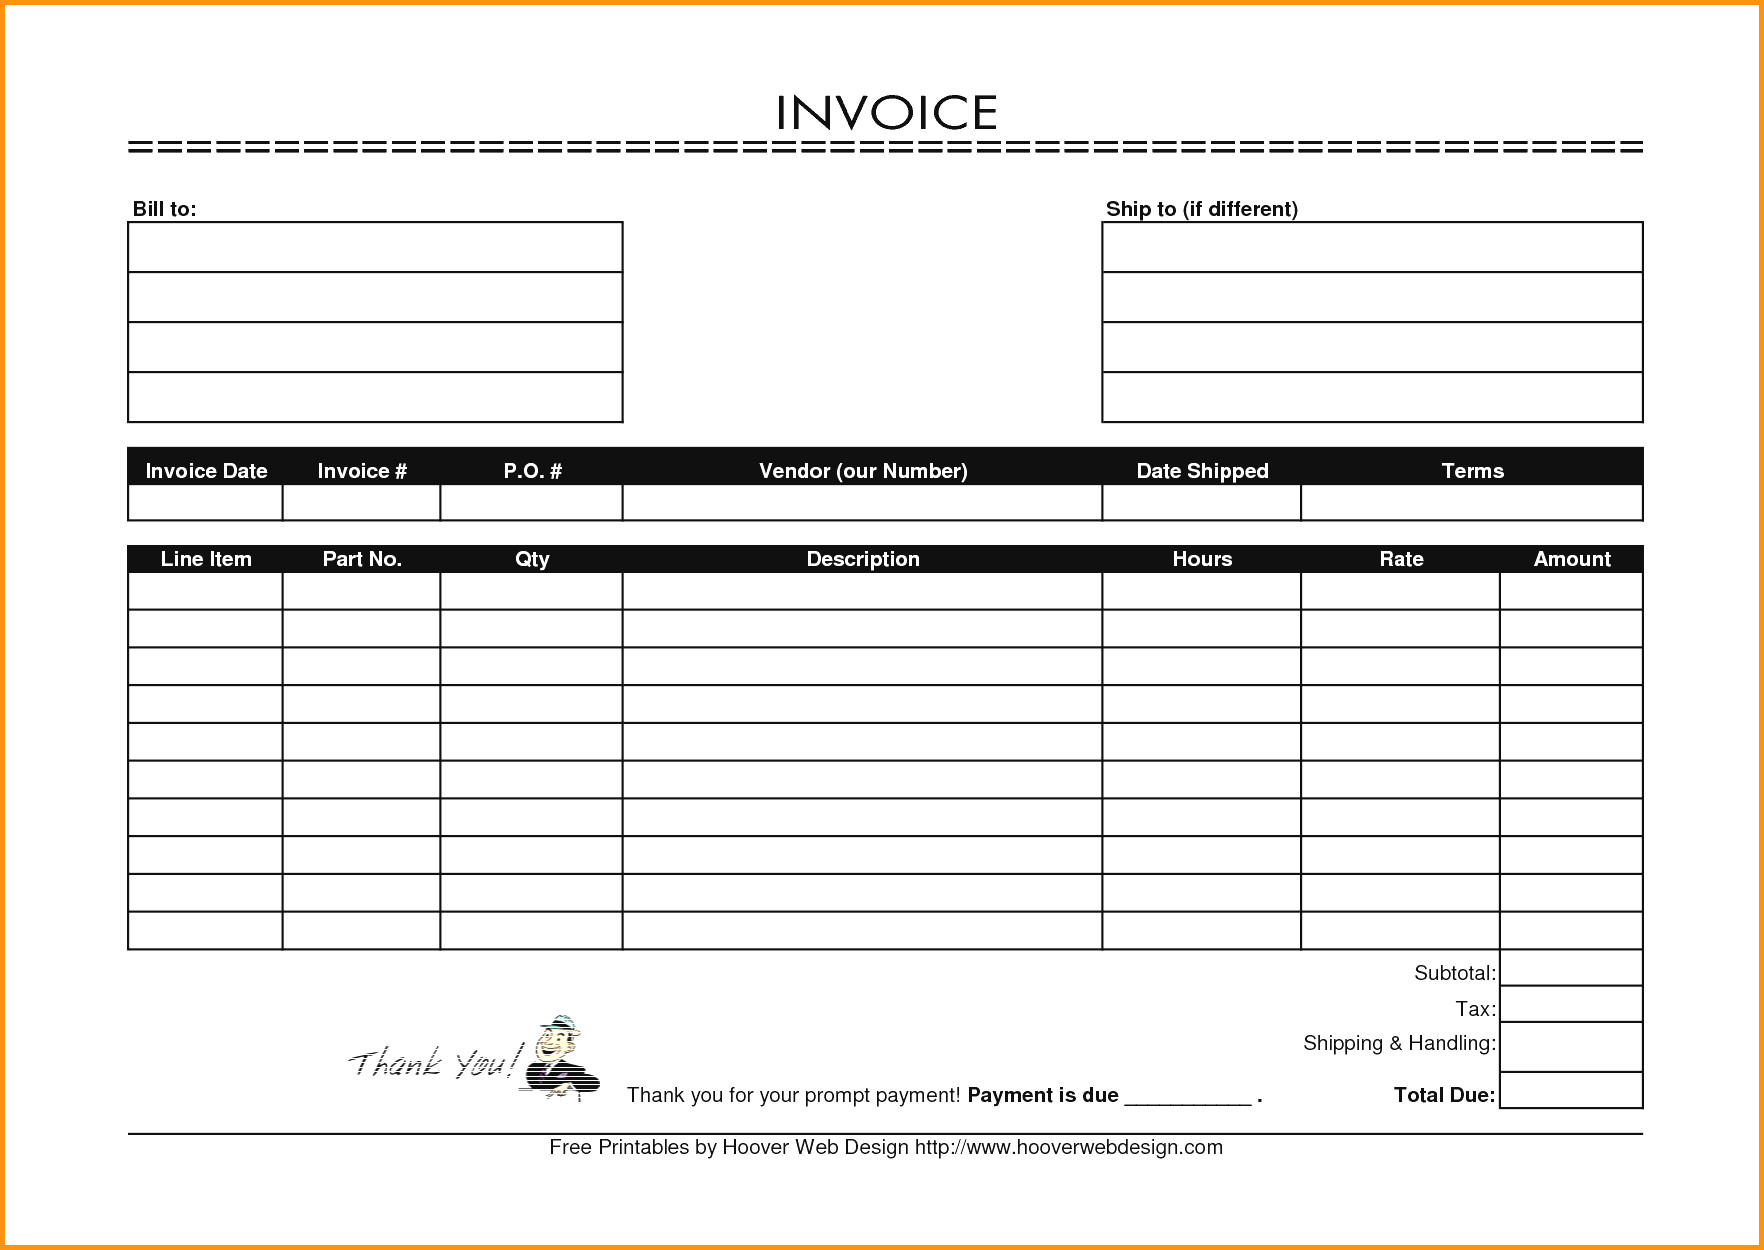 Sample Invoices Printable Free Uk Billing Format Blank Invoice - Free Printable Blank Invoice Sheet